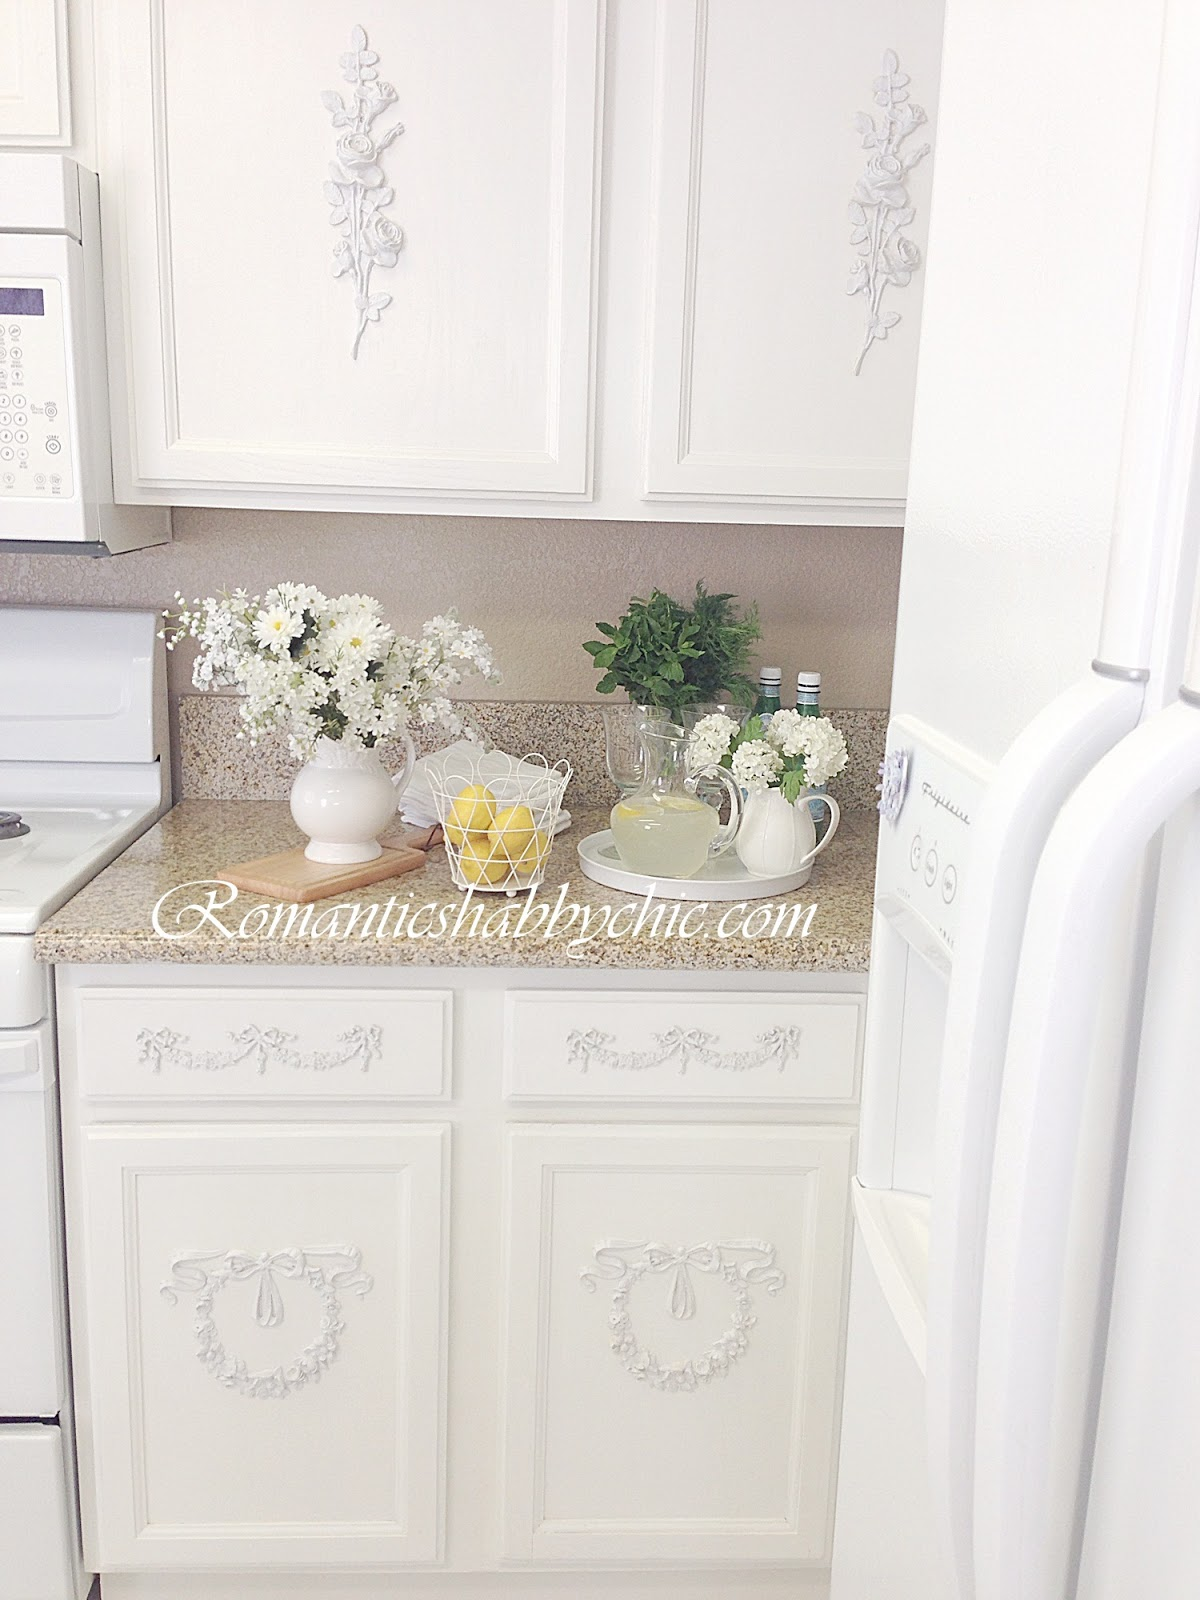 shabby chic kitchen decor terry cloth towels romantic home romanticshabbychic com